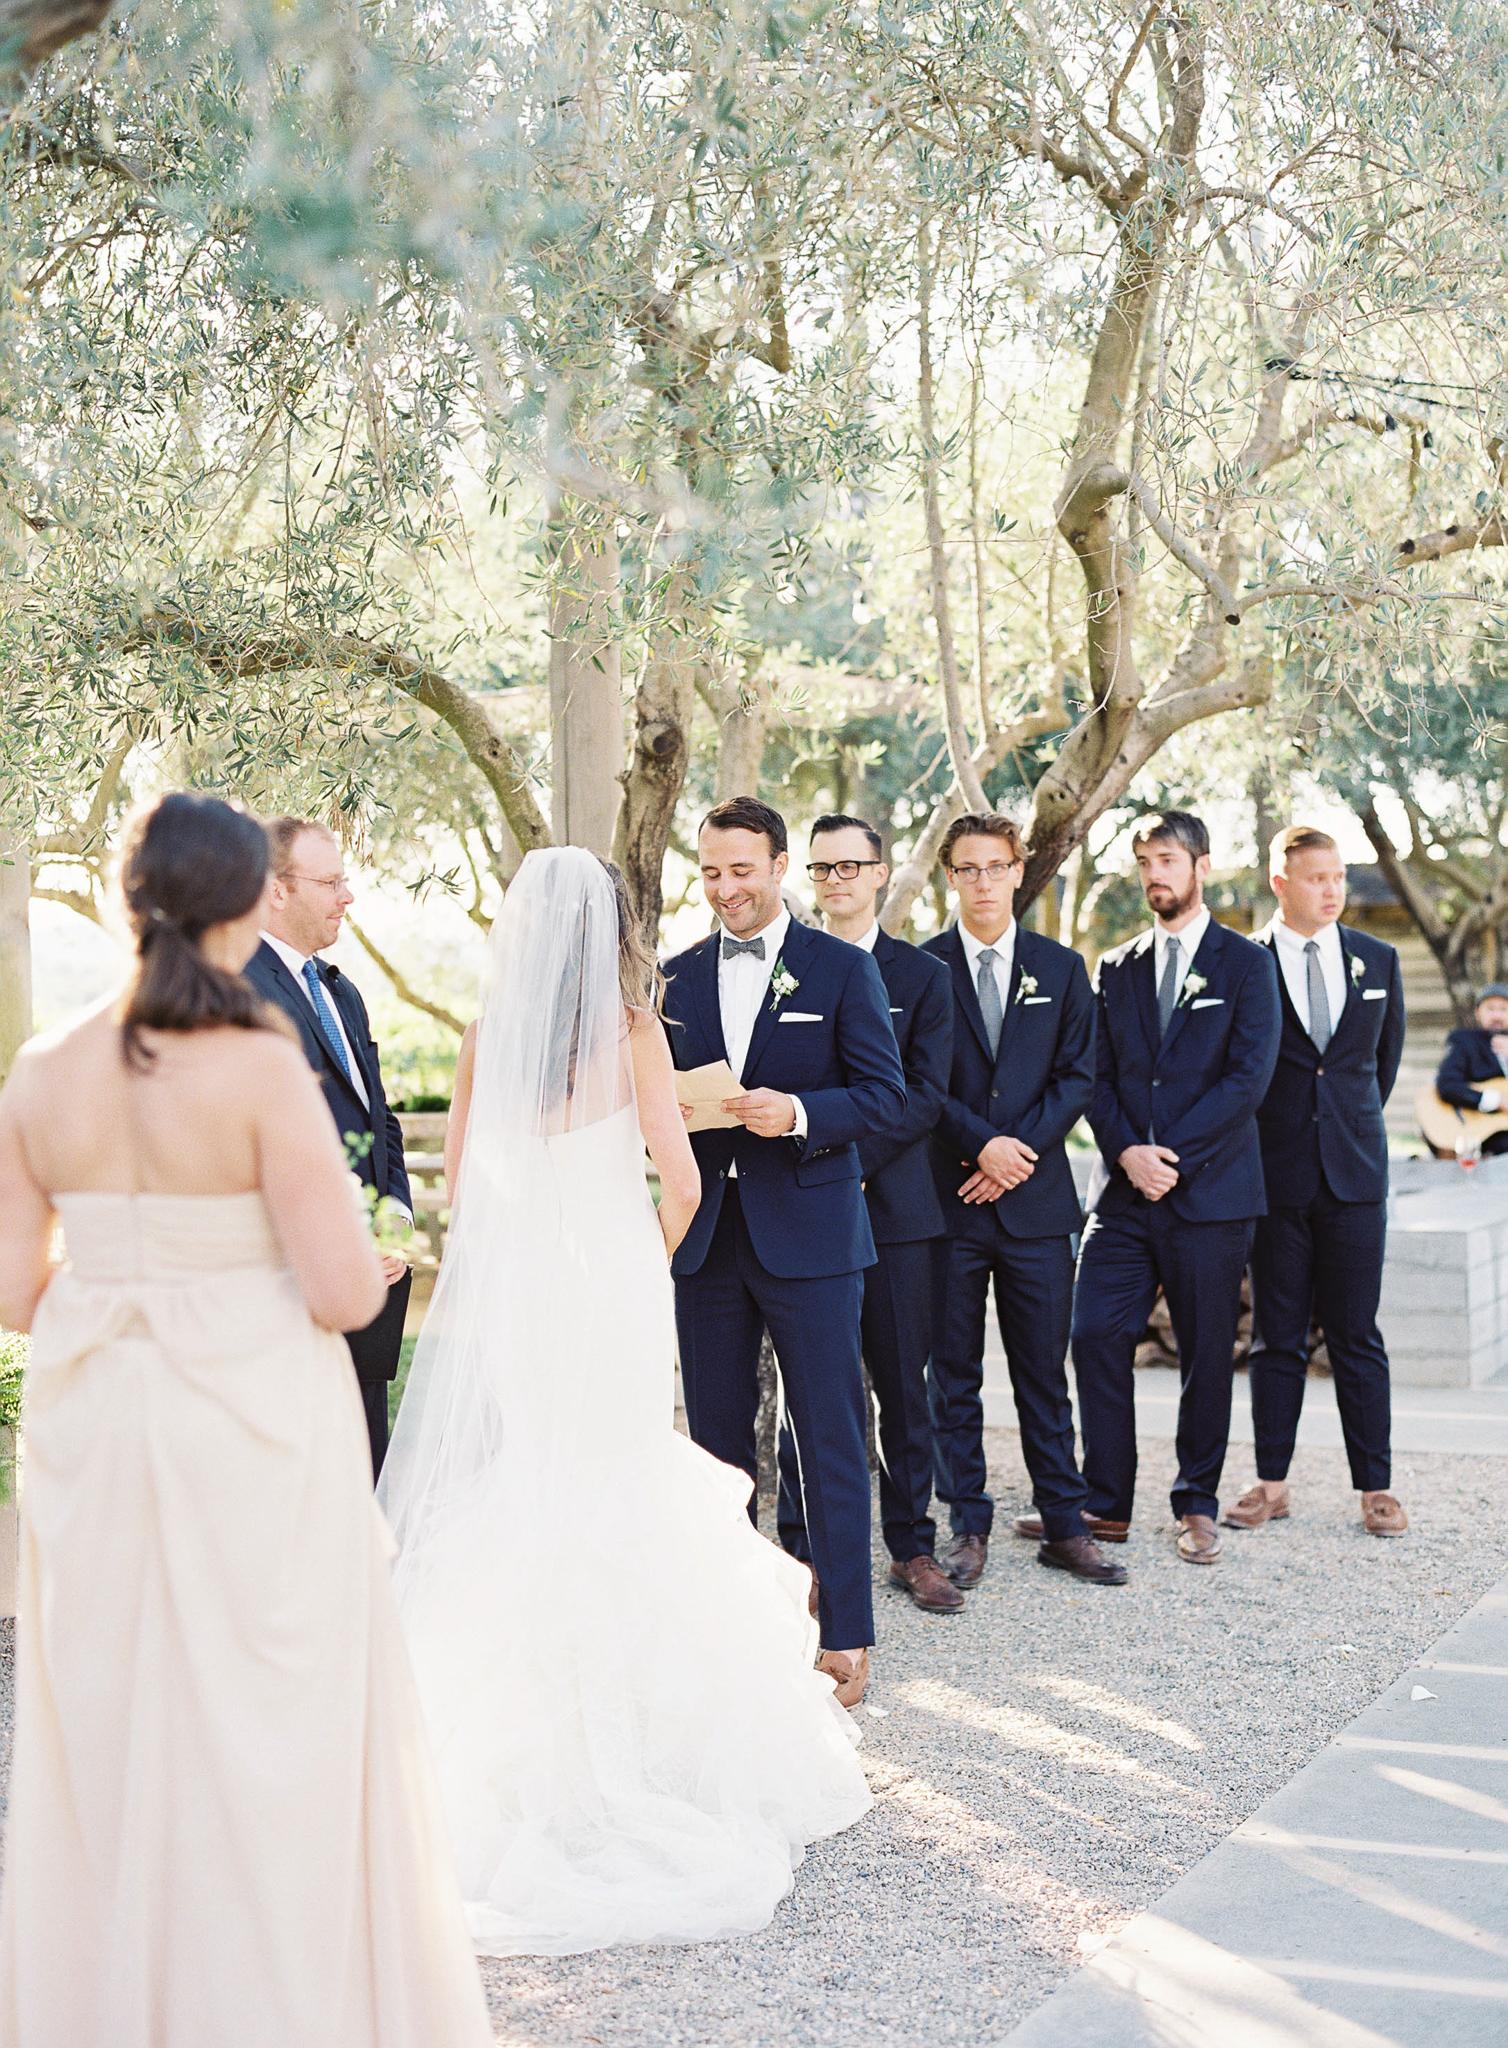 Meghan Mehan Photography - Fine Art Film Wedding Photography - San Francisco   Napa   Sonoma   Big Sur   Chicago   Minneapolis   Milwaukee   Lake Geneva   Door County   Wisconsin 025.jpg